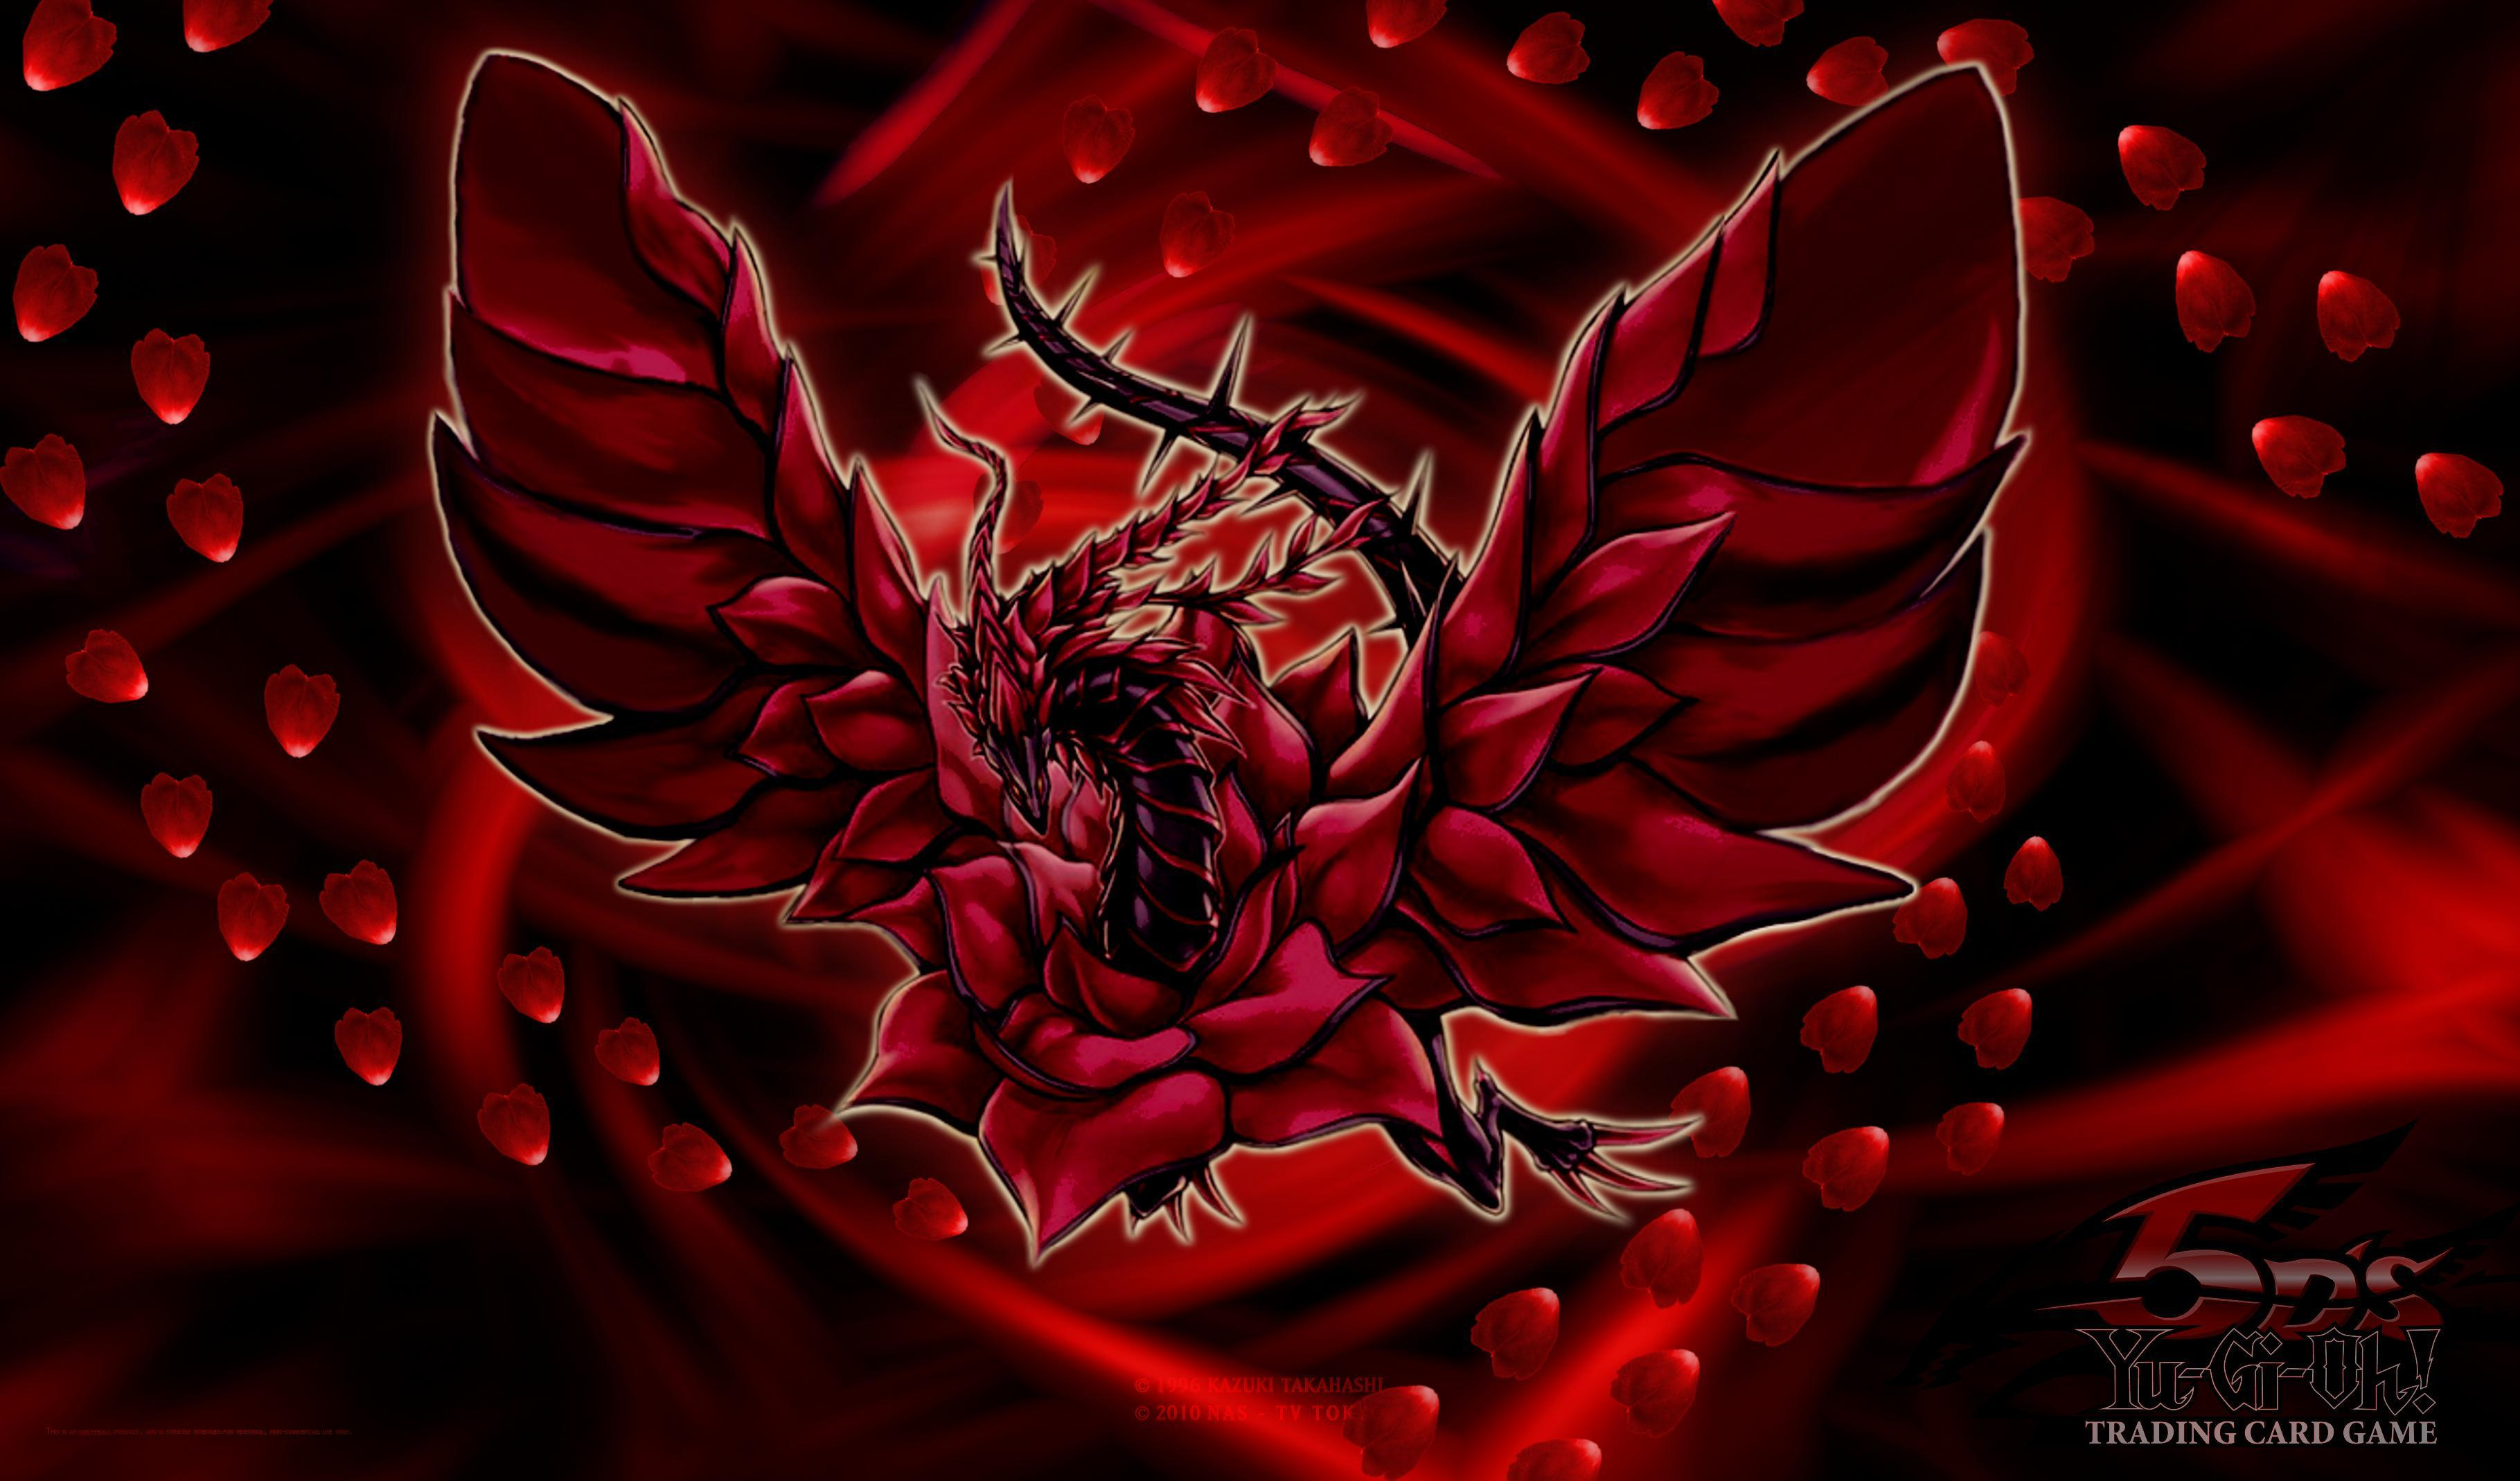 Black Rose Dragon Wallpapers Top Free Black Rose Dragon Backgrounds Wallpaperaccess